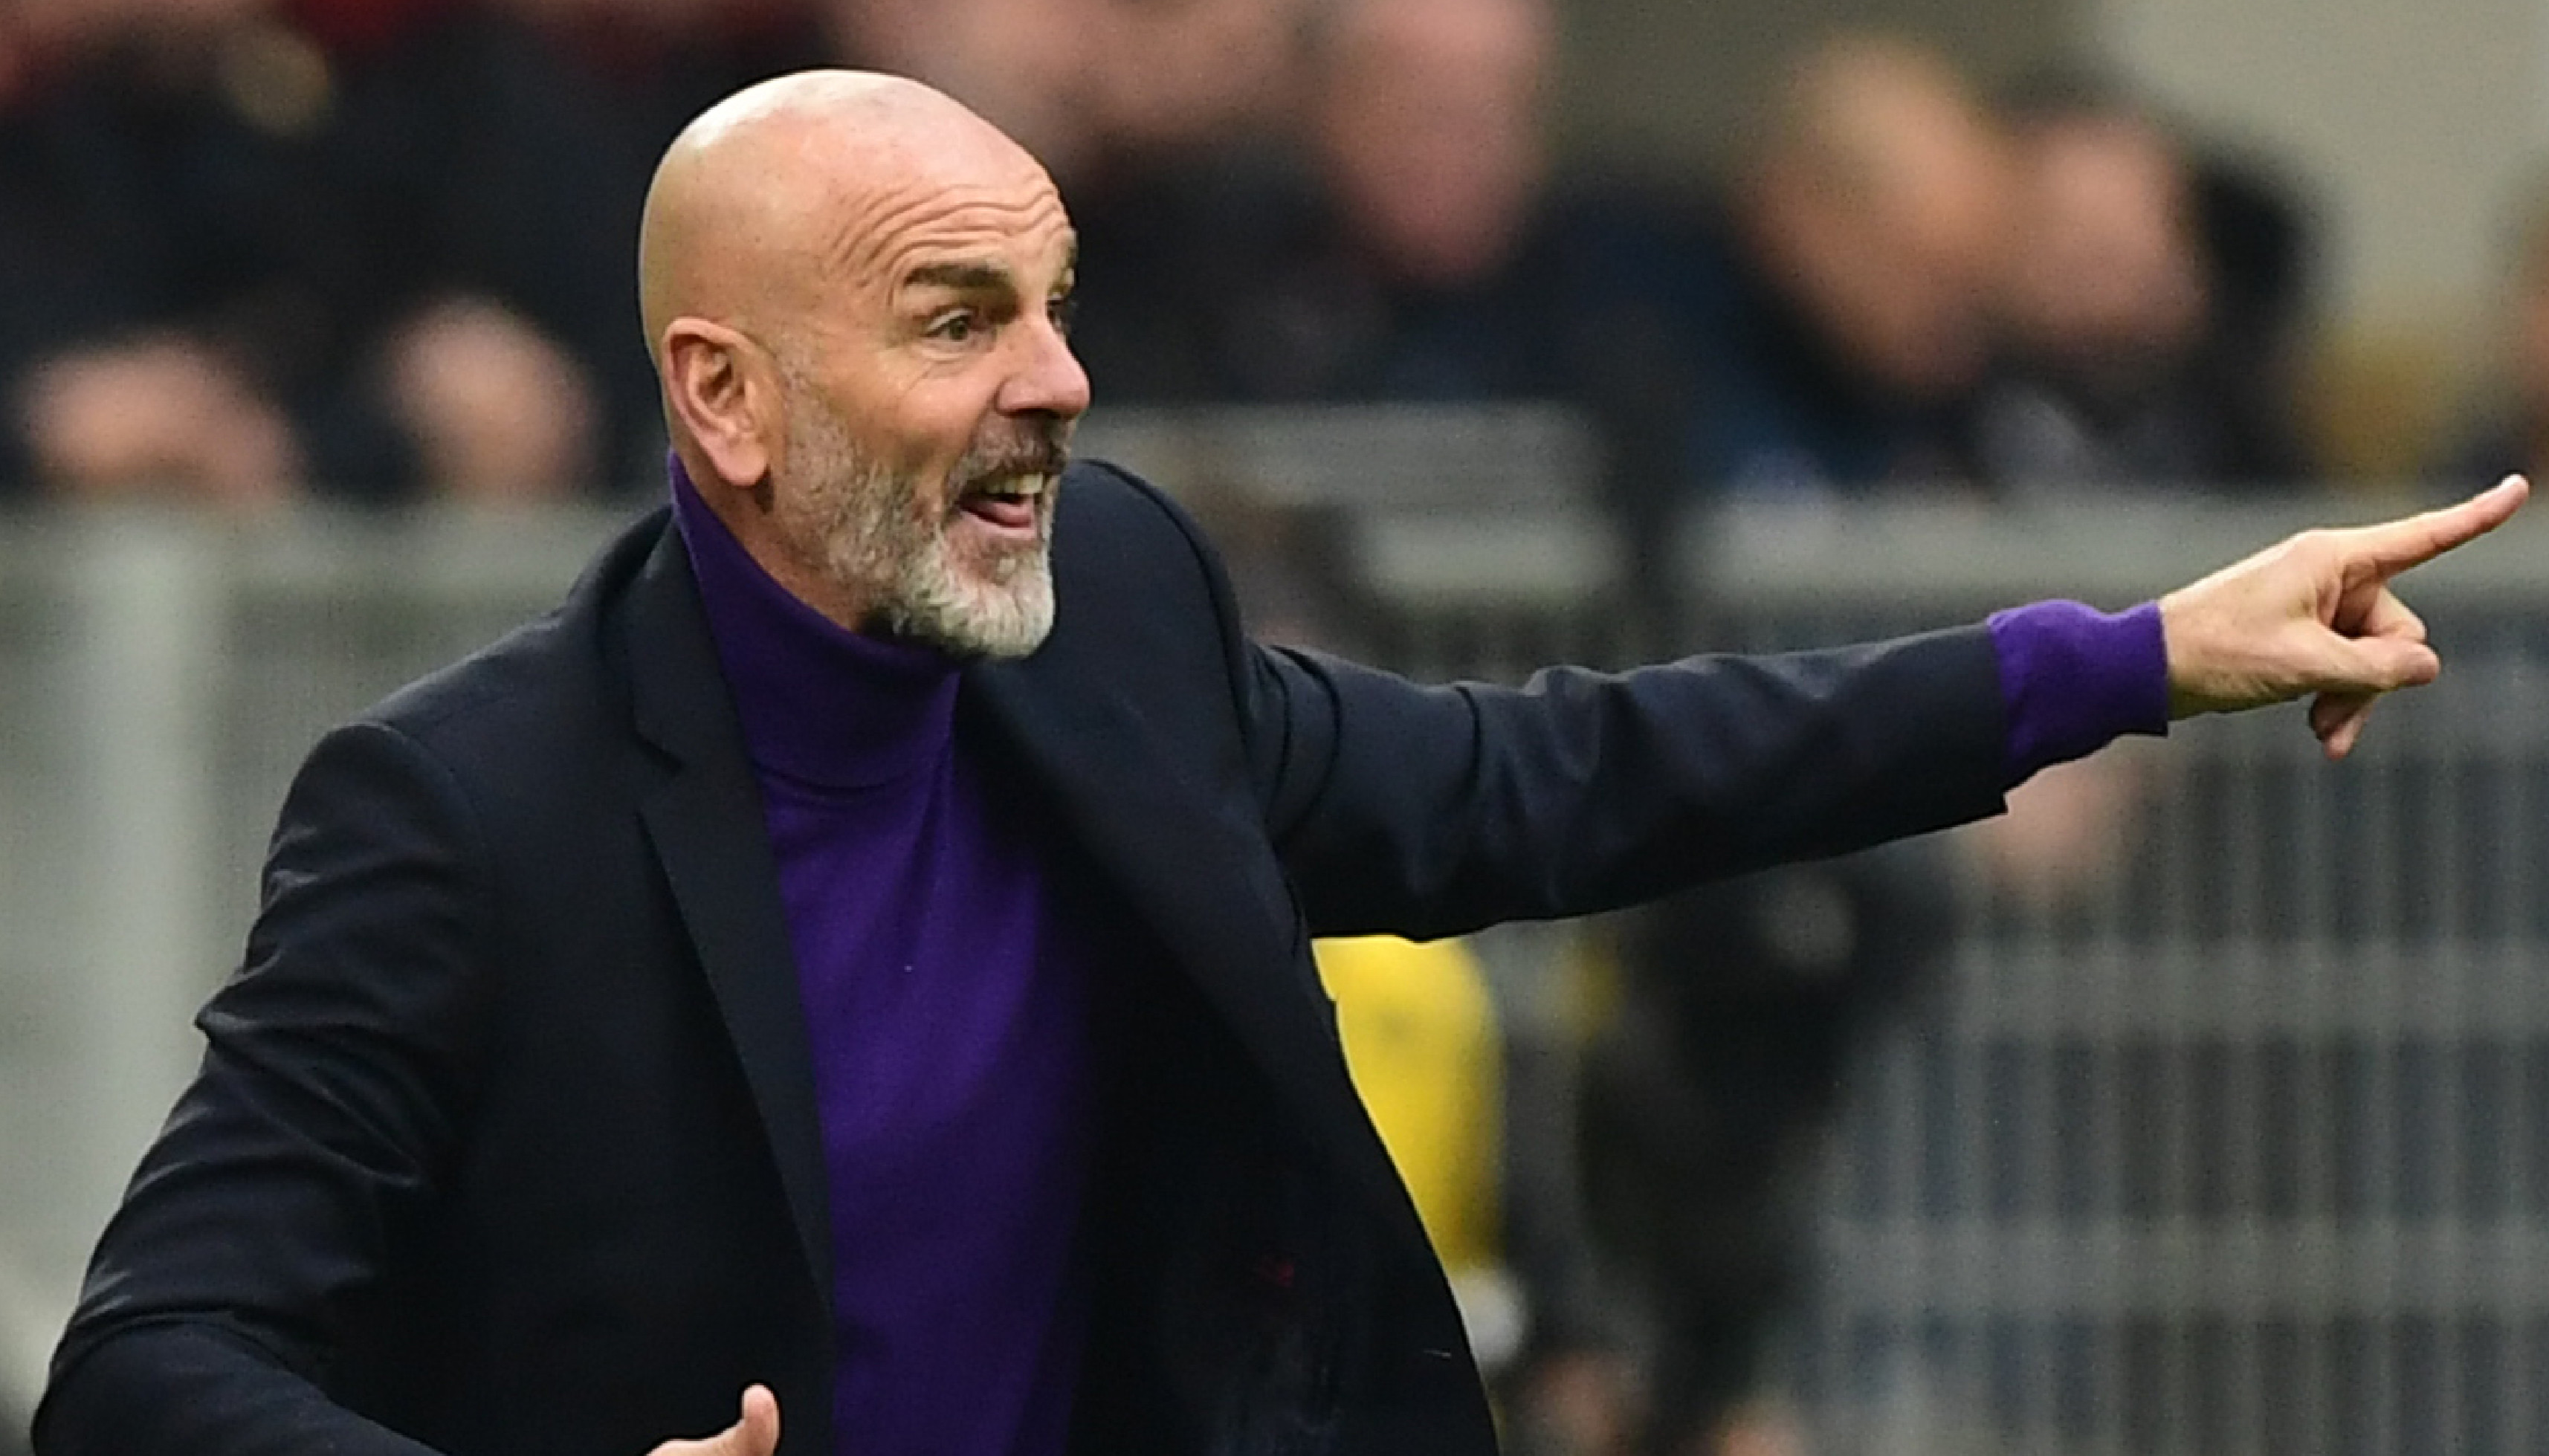 Fiorentina, Cognigni a Pioli: